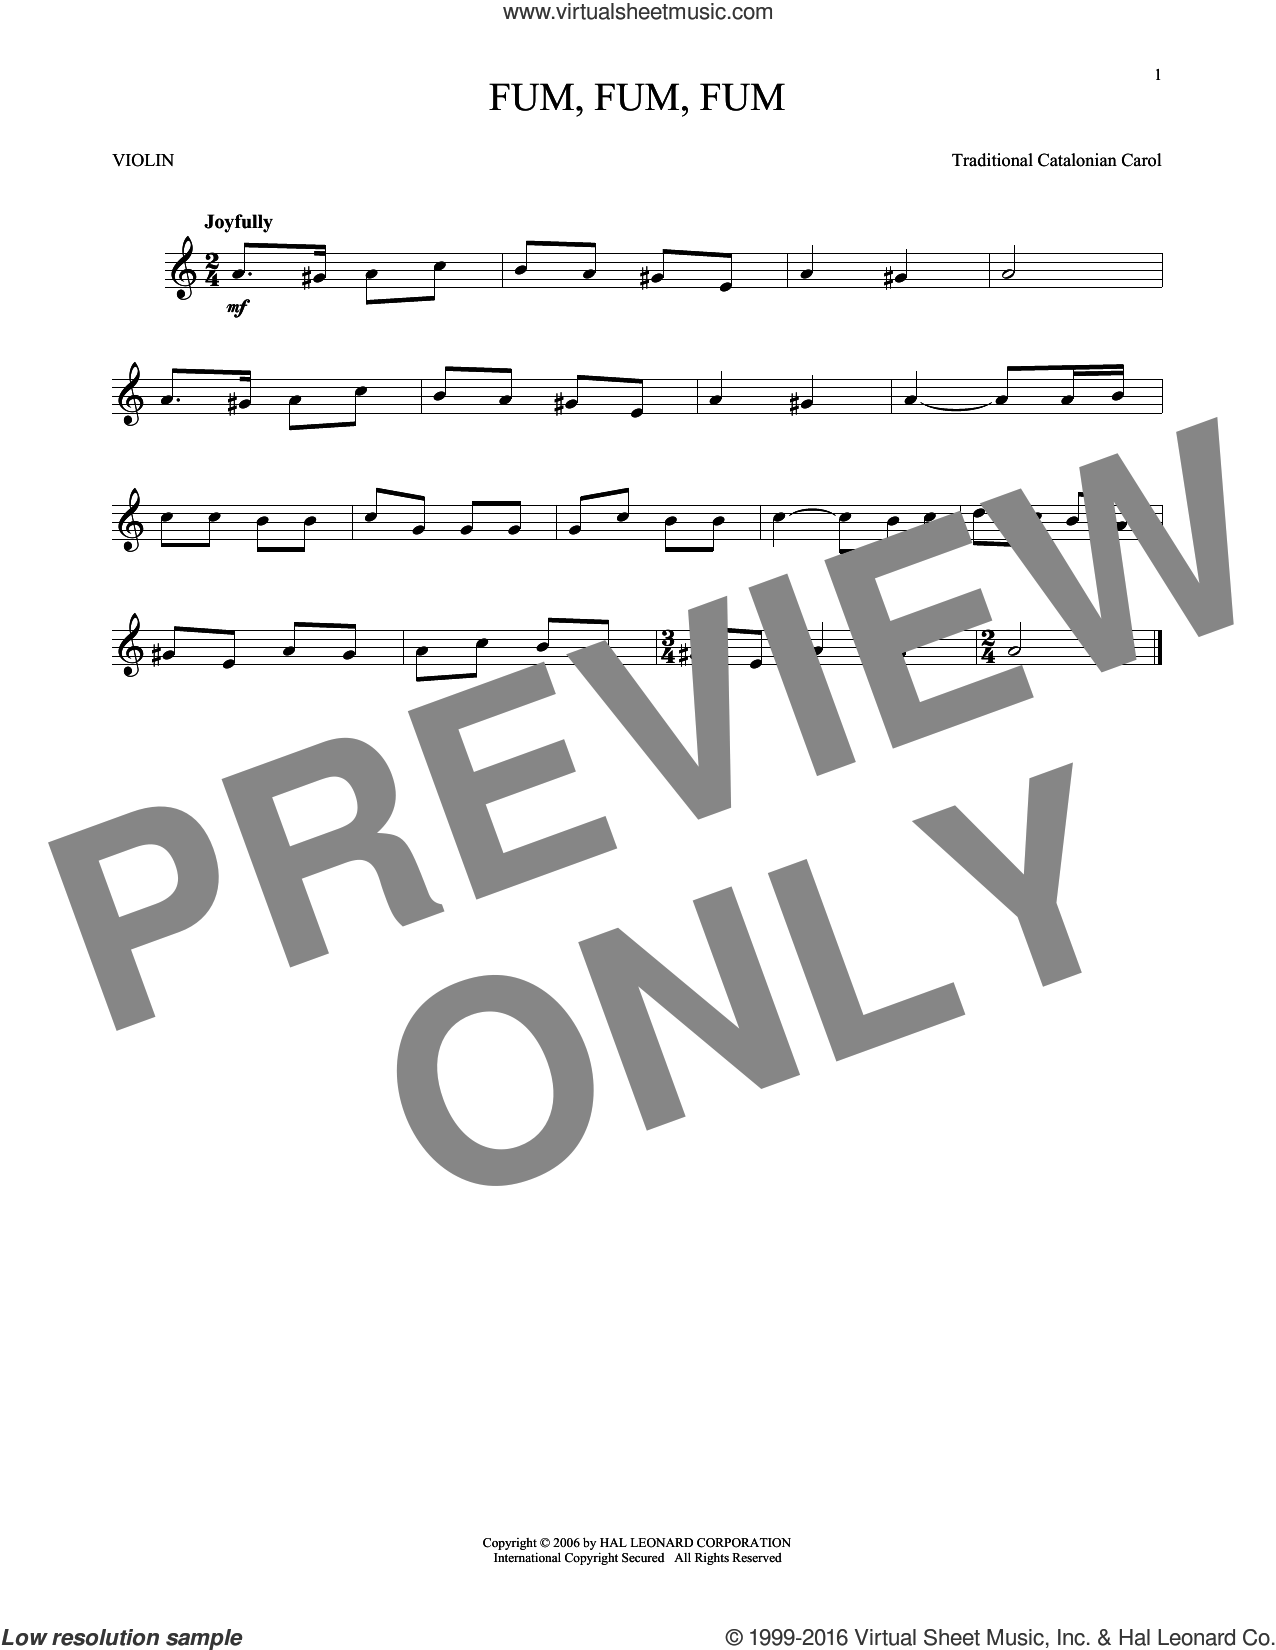 Fum, Fum, Fum sheet music for violin solo, intermediate skill level